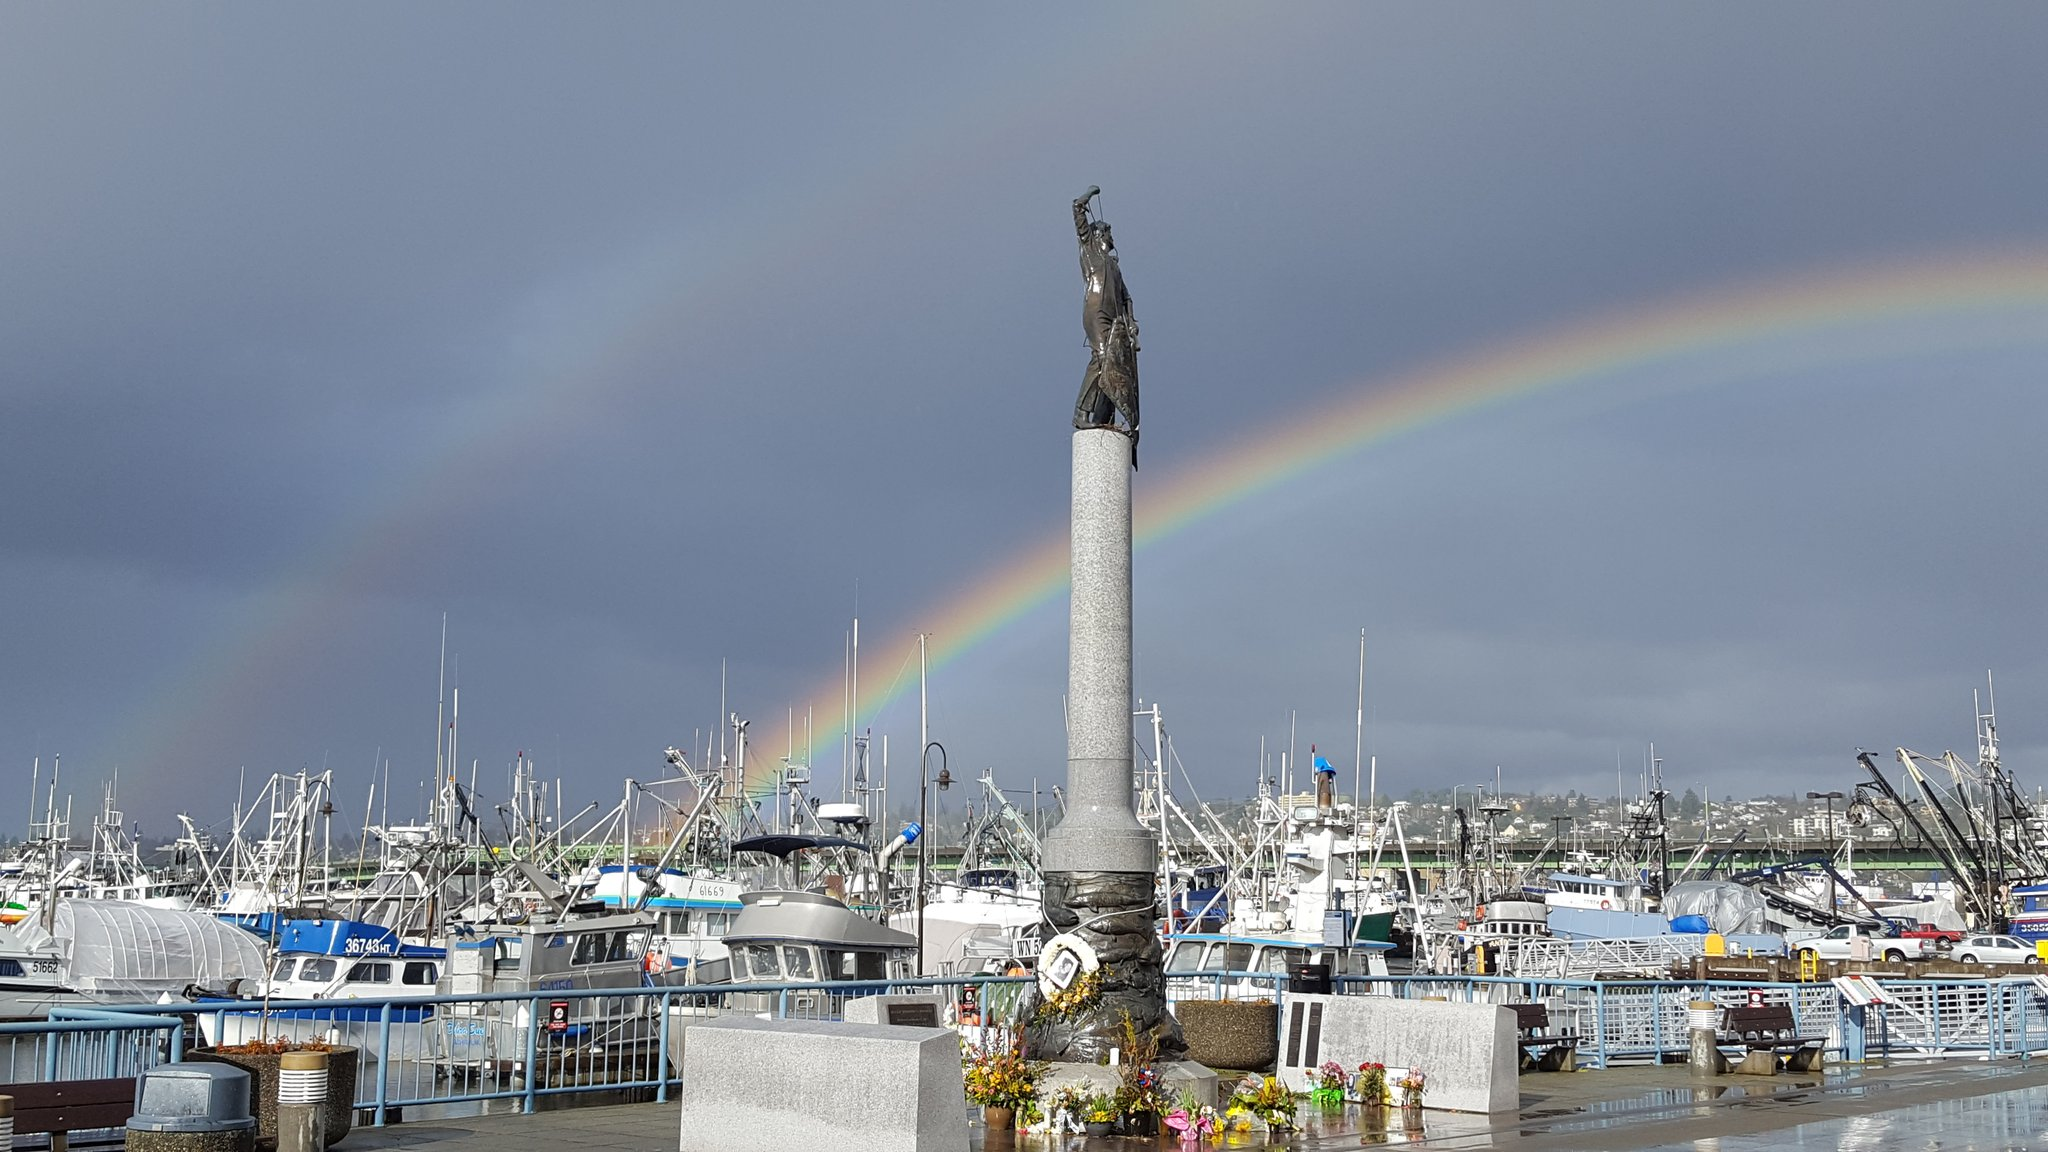 Seattle Home Port - Fishermen's Memorial